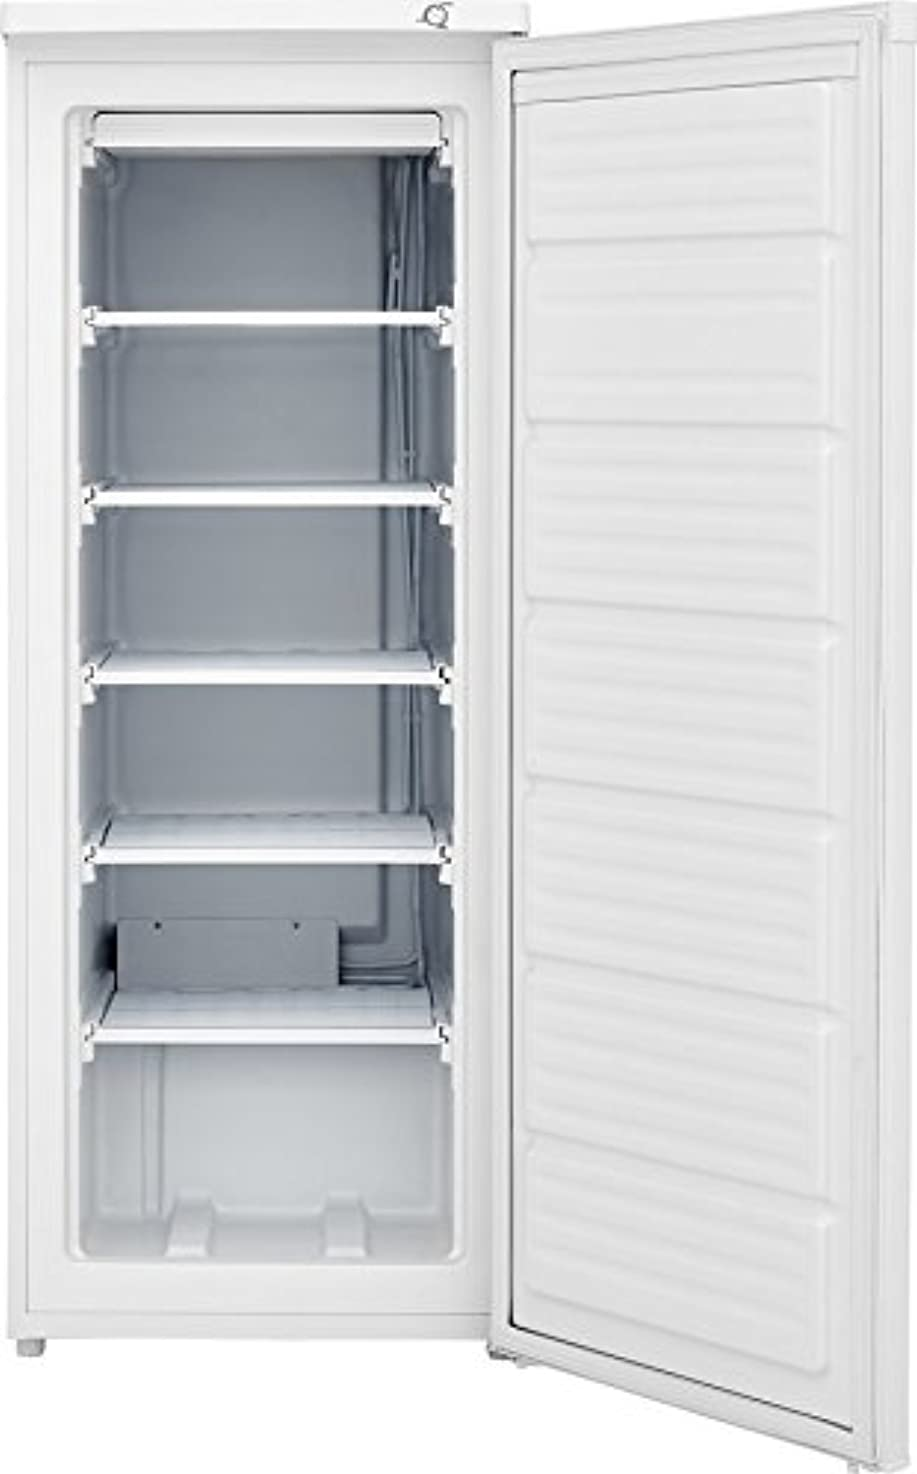 Frigidaire FFFU06M1TW 23 Inch Freestanding Freezer with 6 cu. ft. Capacity in White